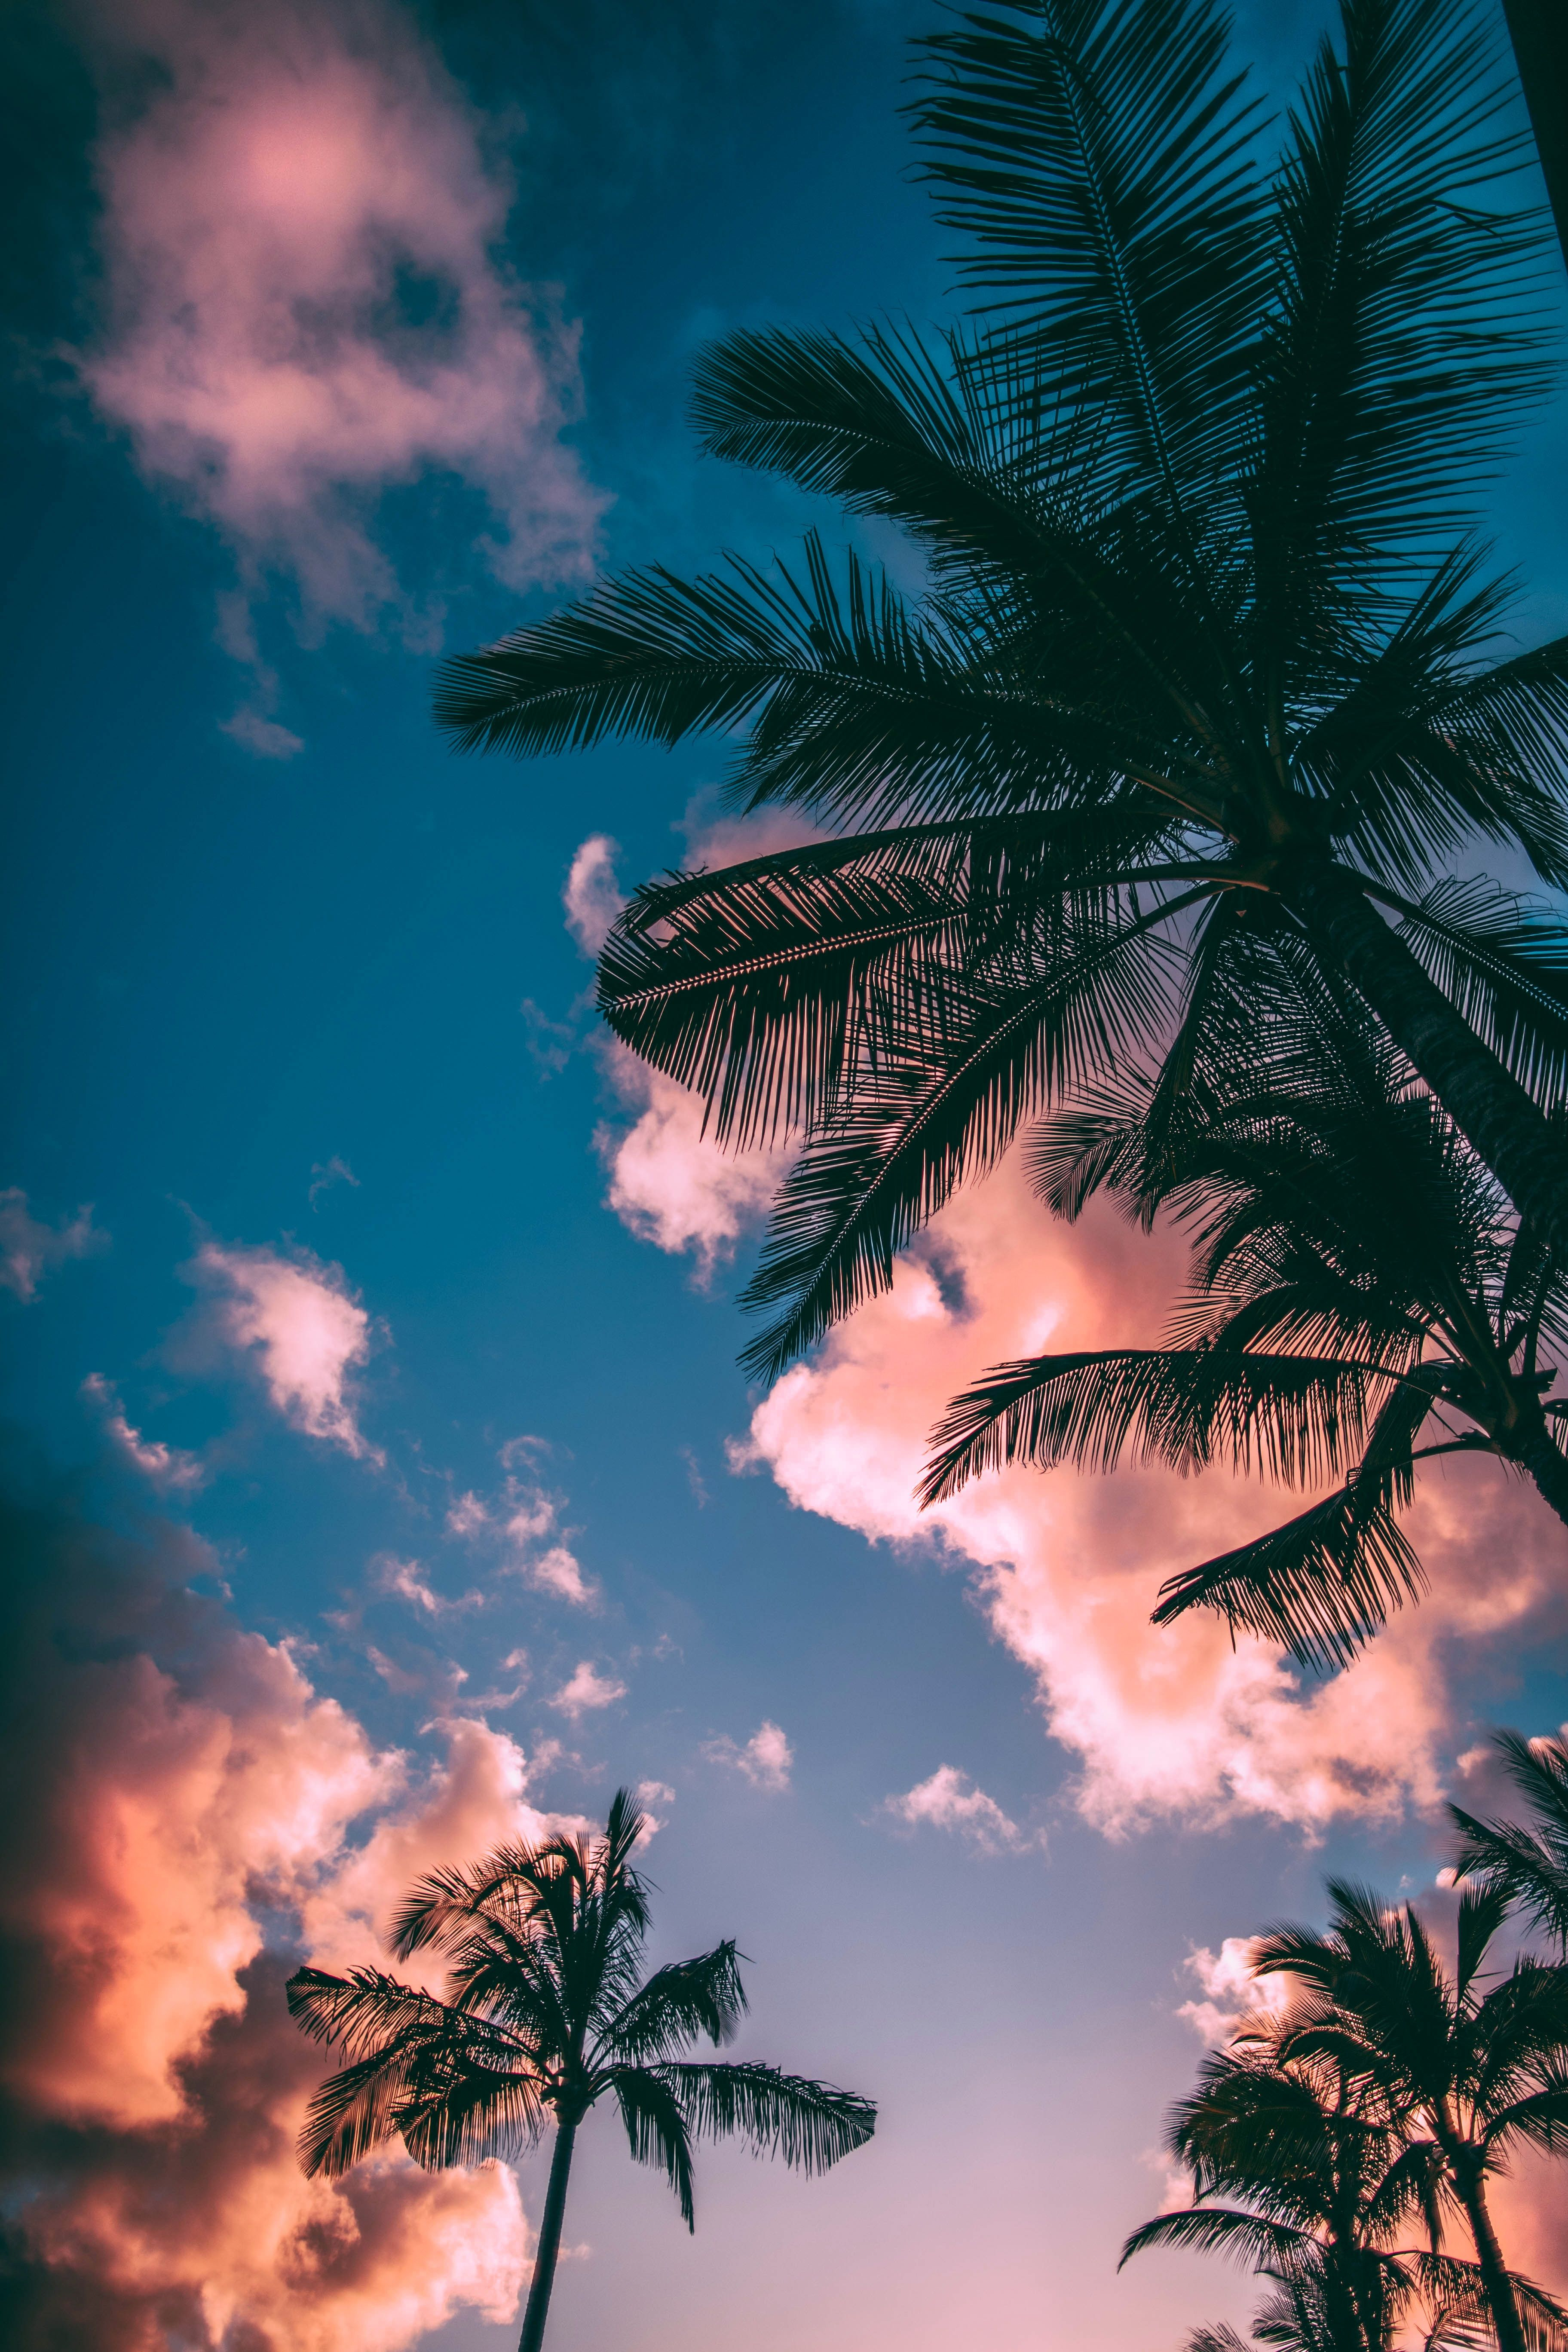 Palm Beach Clouds Wallpaper Background Holidays Tropical Island Beach Beautiful Nature Wallpaper Backgrounds Phone Wallpapers Sunset Wallpaper